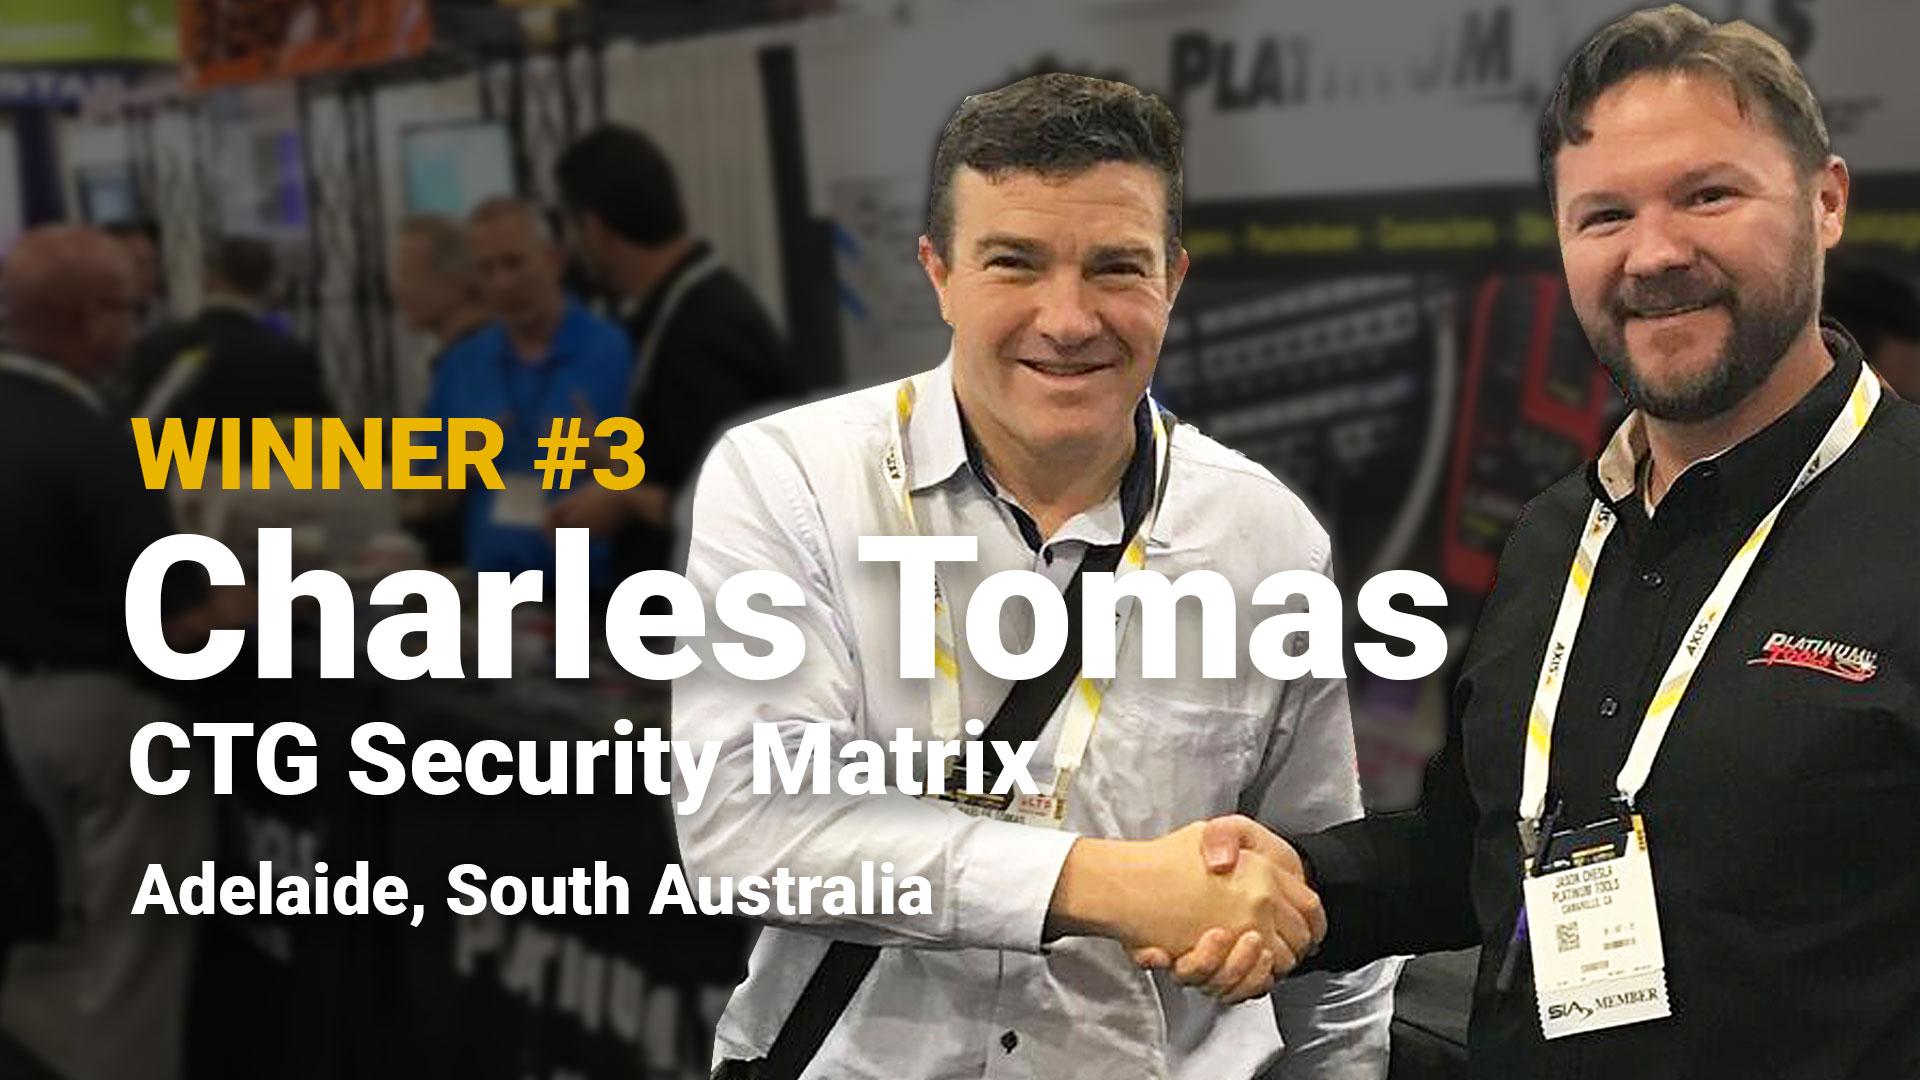 Winner #3 Charles Tomas CTG Security Matrix